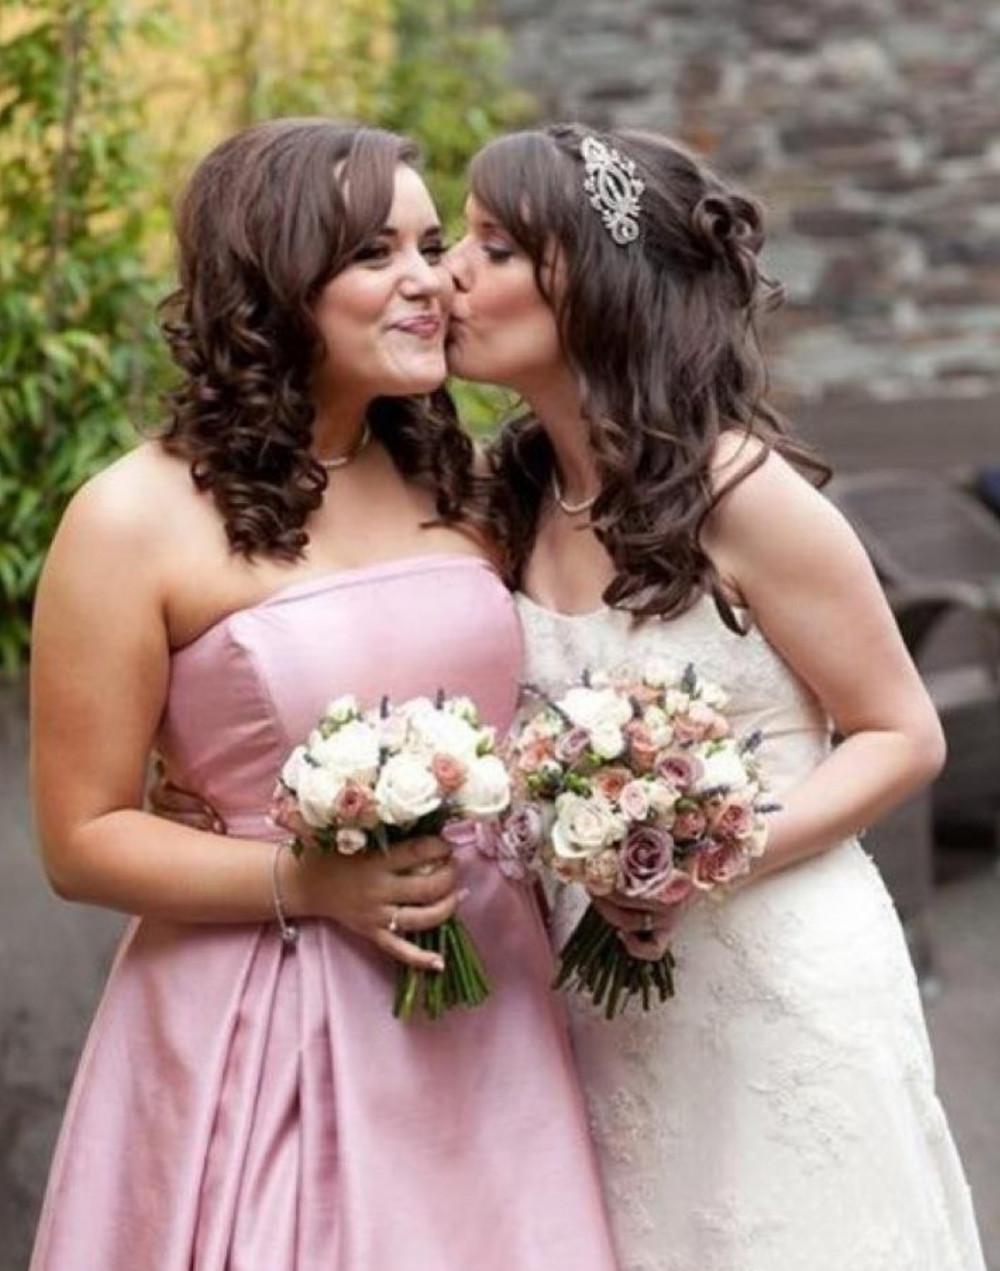 Makeup for bride Jayde and bridesmaid Jazmine ❤️❤️ - Make Me Bridal Artist: Chloe Dixon. #classic #bridalmakeup #pretty